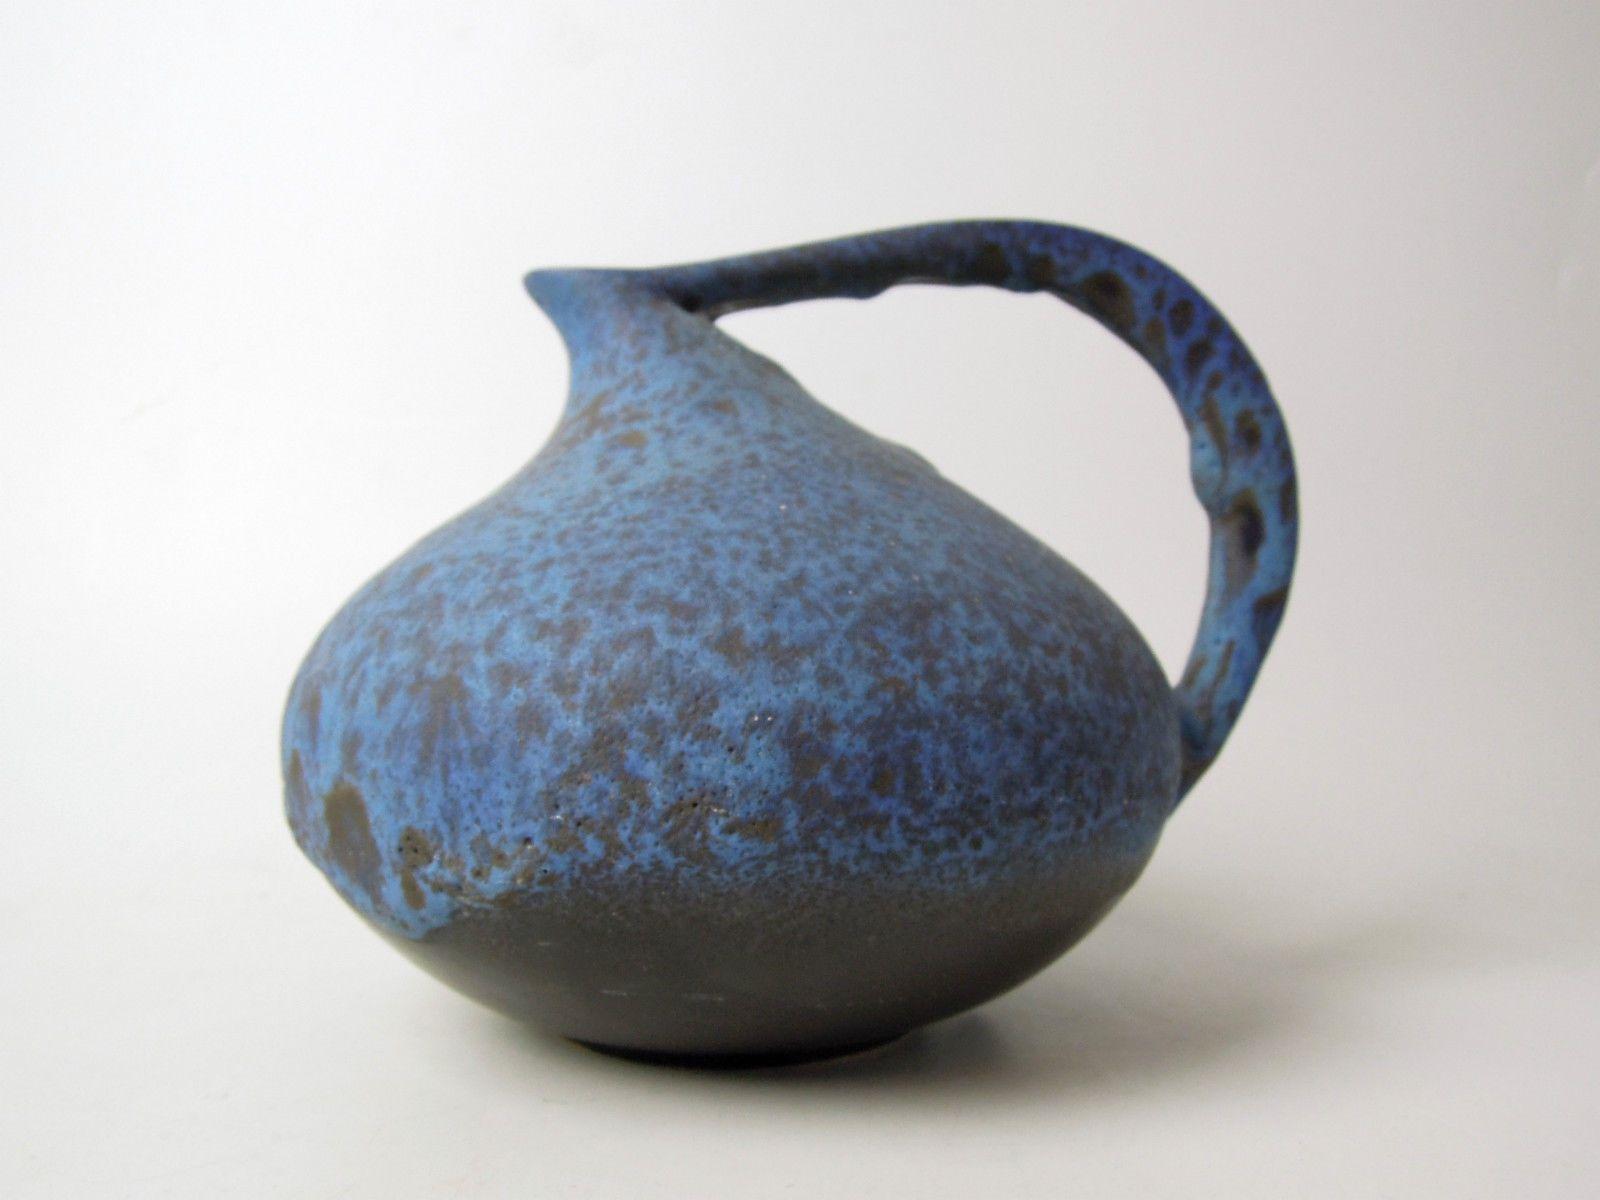 Ruscha 313 fat lava german pottery modernist jug vase vintage kurt ruscha 313 fat lava german pottery modernist jug vase vintage kurt tschorner 60s in pottery reviewsmspy